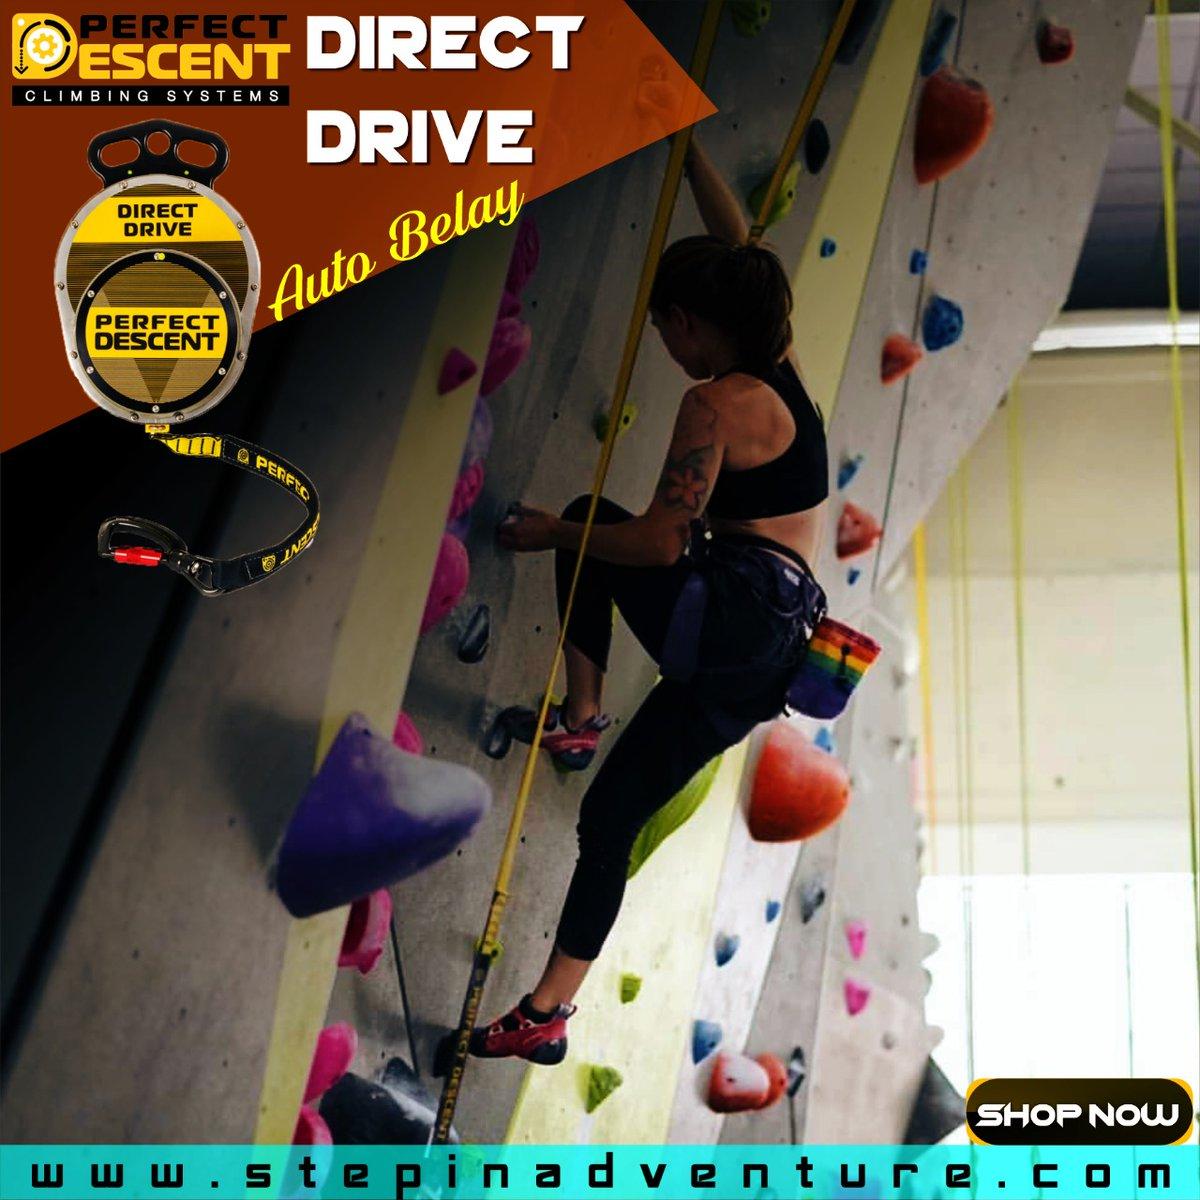 Direct Drive Auto Belay  Perfect Descent Climbing Systems https://bit.ly/2YXtMv2 .#rockclimbingwall #leadclimbinggoals #speedclimbing #speedclimber #leadclimber #climbersofindia #climbernation  #puneclimbers #climberscommunity #mountainclimbers #climbinggym #indoorclimbingpic.twitter.com/6tRffnrMuf